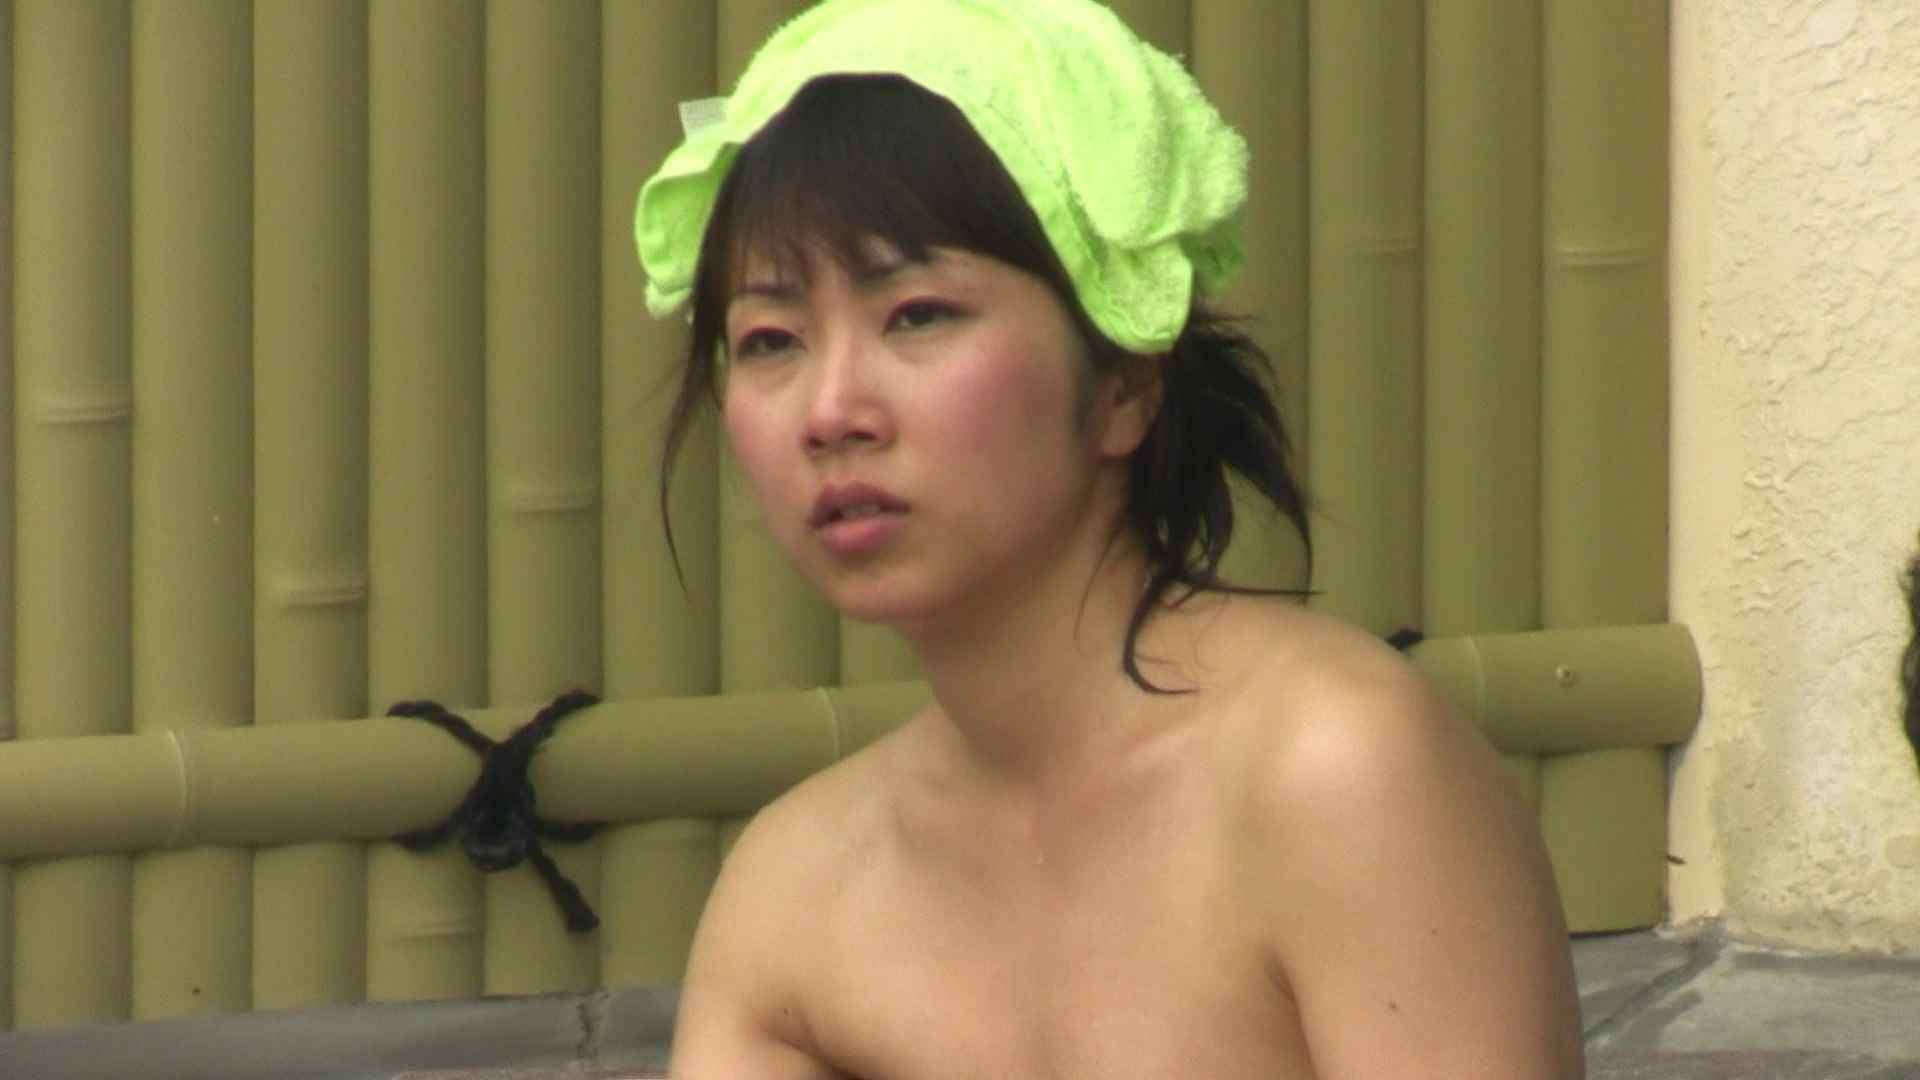 Aquaな露天風呂Vol.671 盗撮 おまんこ動画流出 80PICs 74